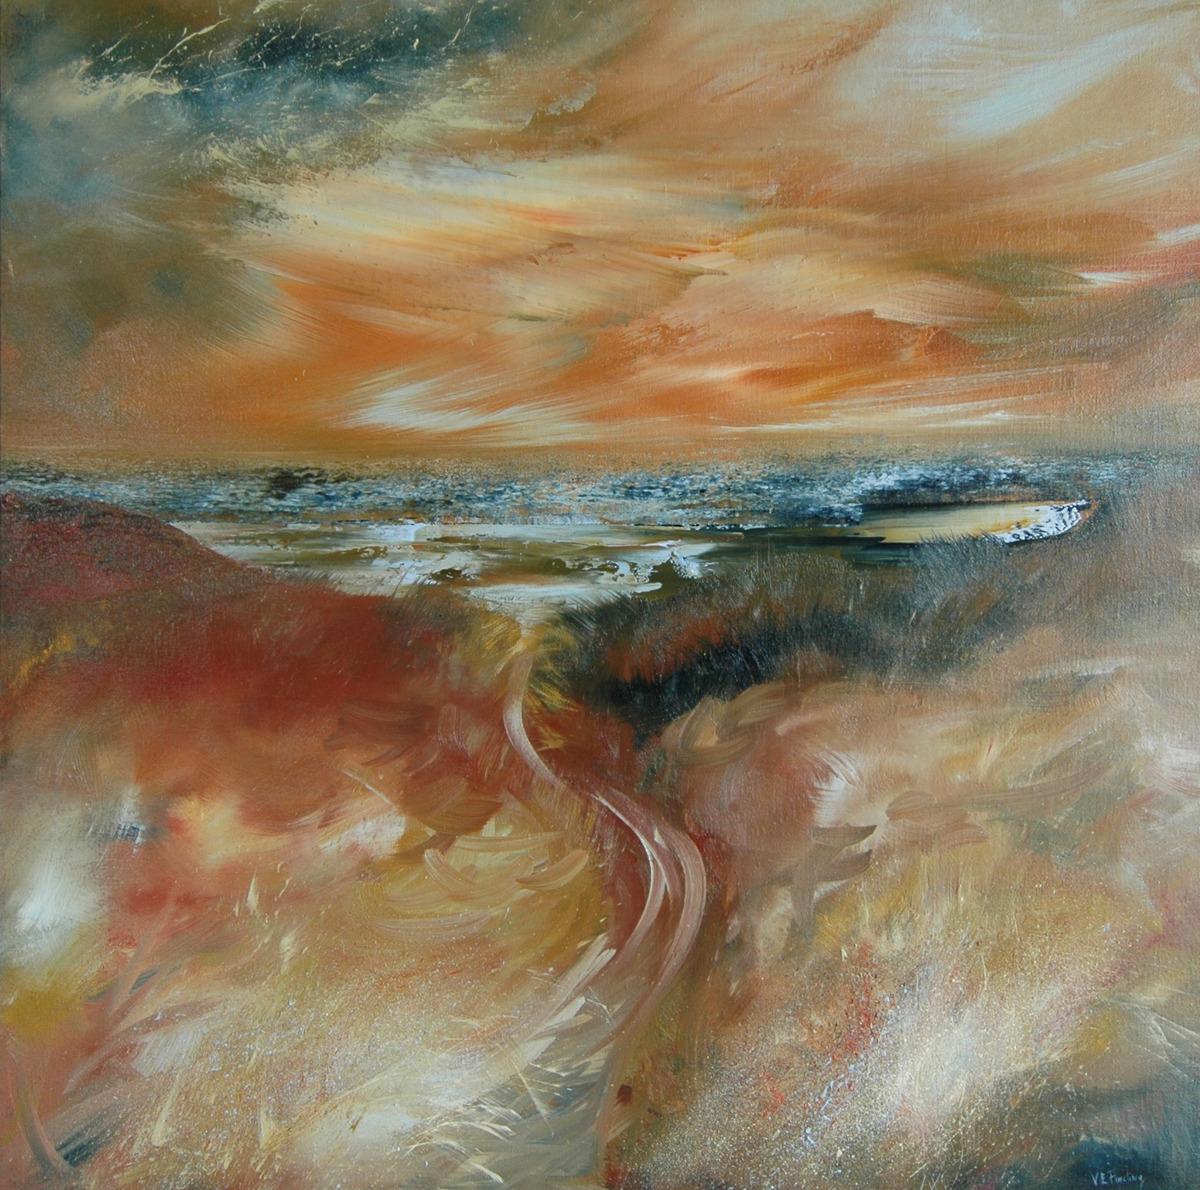 Rustle of the Dunes